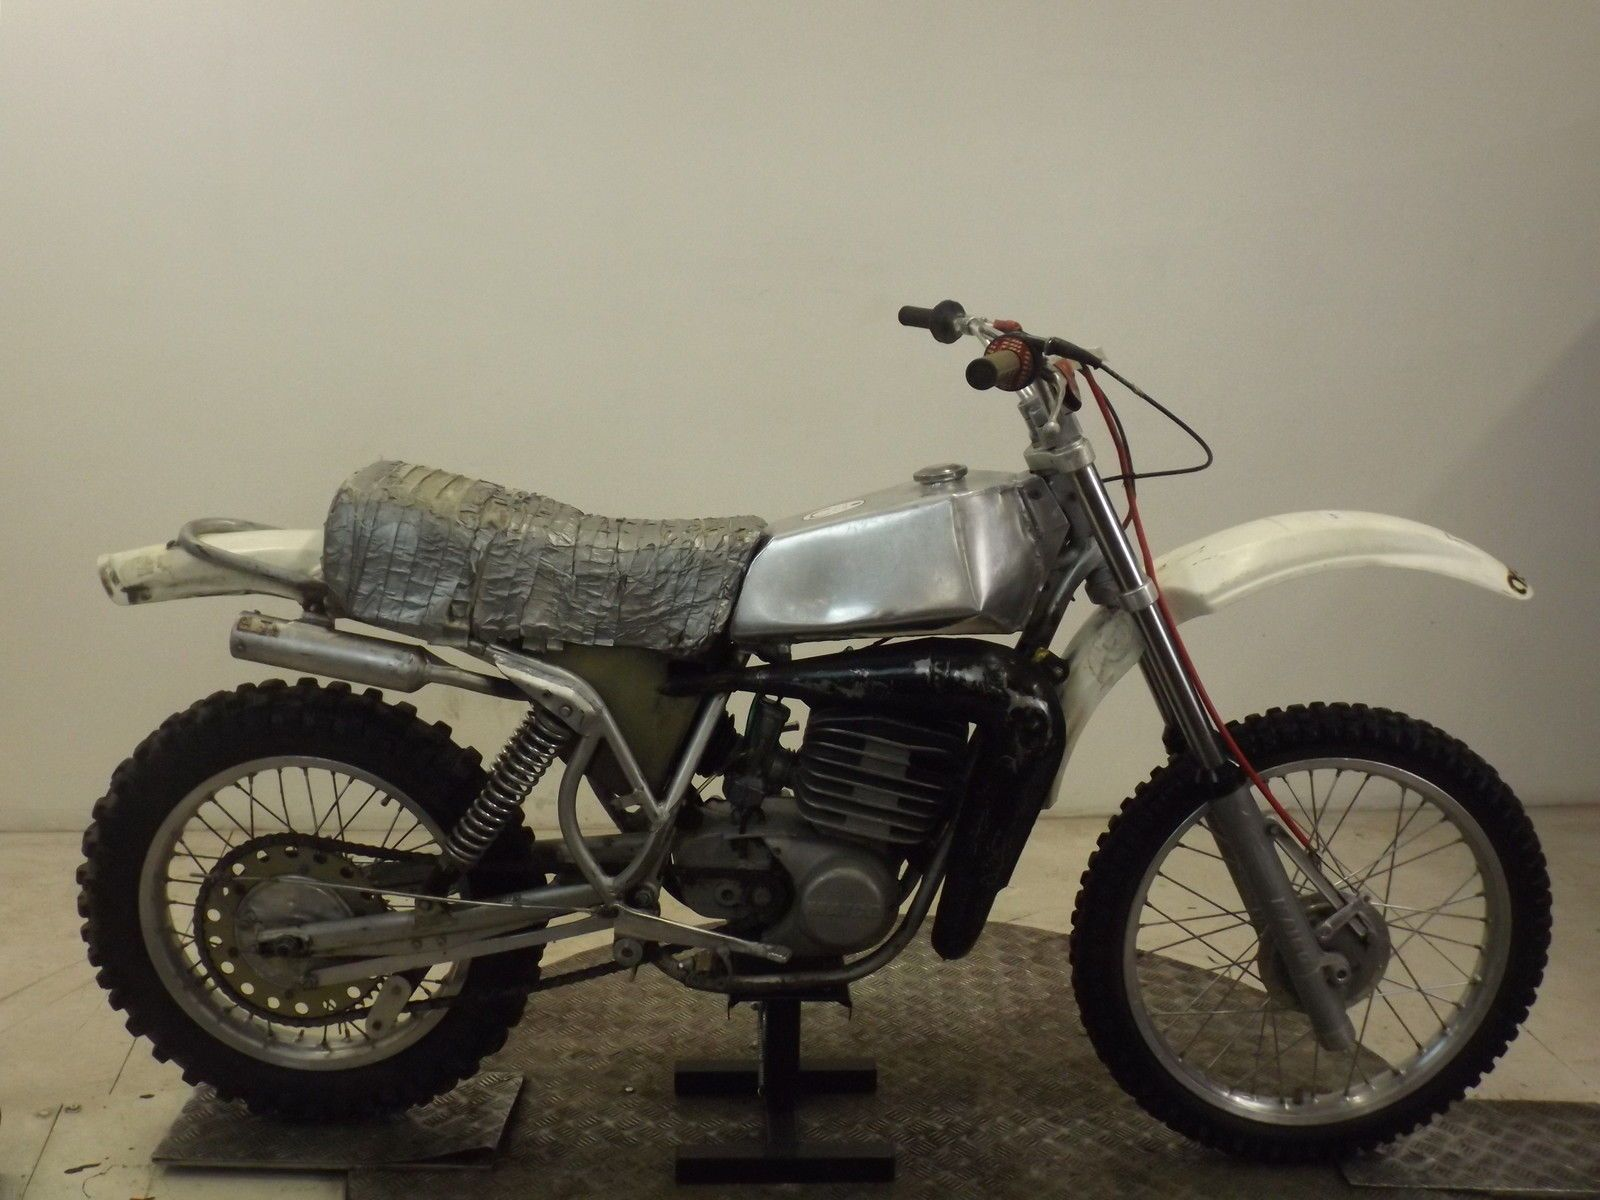 MAICO MC250 1976 2 STROKE CLASSIC TWINSHOCK MOTOCROSS BIKERESTORATION BARN FIND